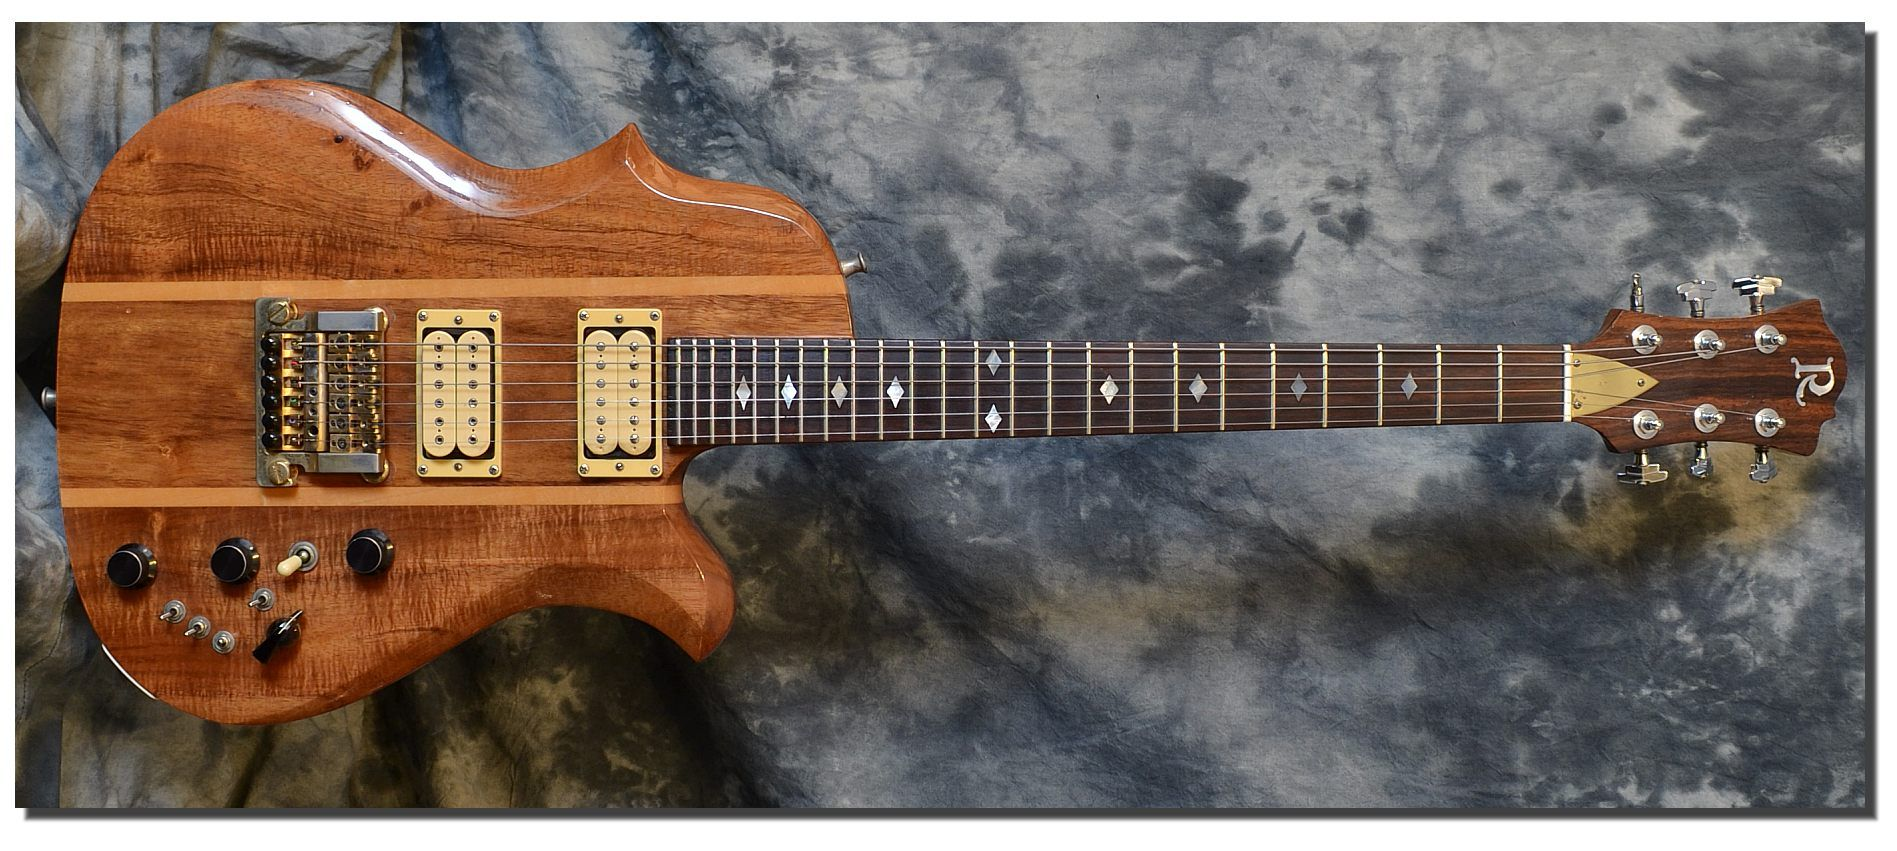 0fc1b67872fa1677824b9bfeb2f14036 1980 bc rich seagull guitars pinterest guitars, bass and bc rich eagle wiring diagram at bakdesigns.co